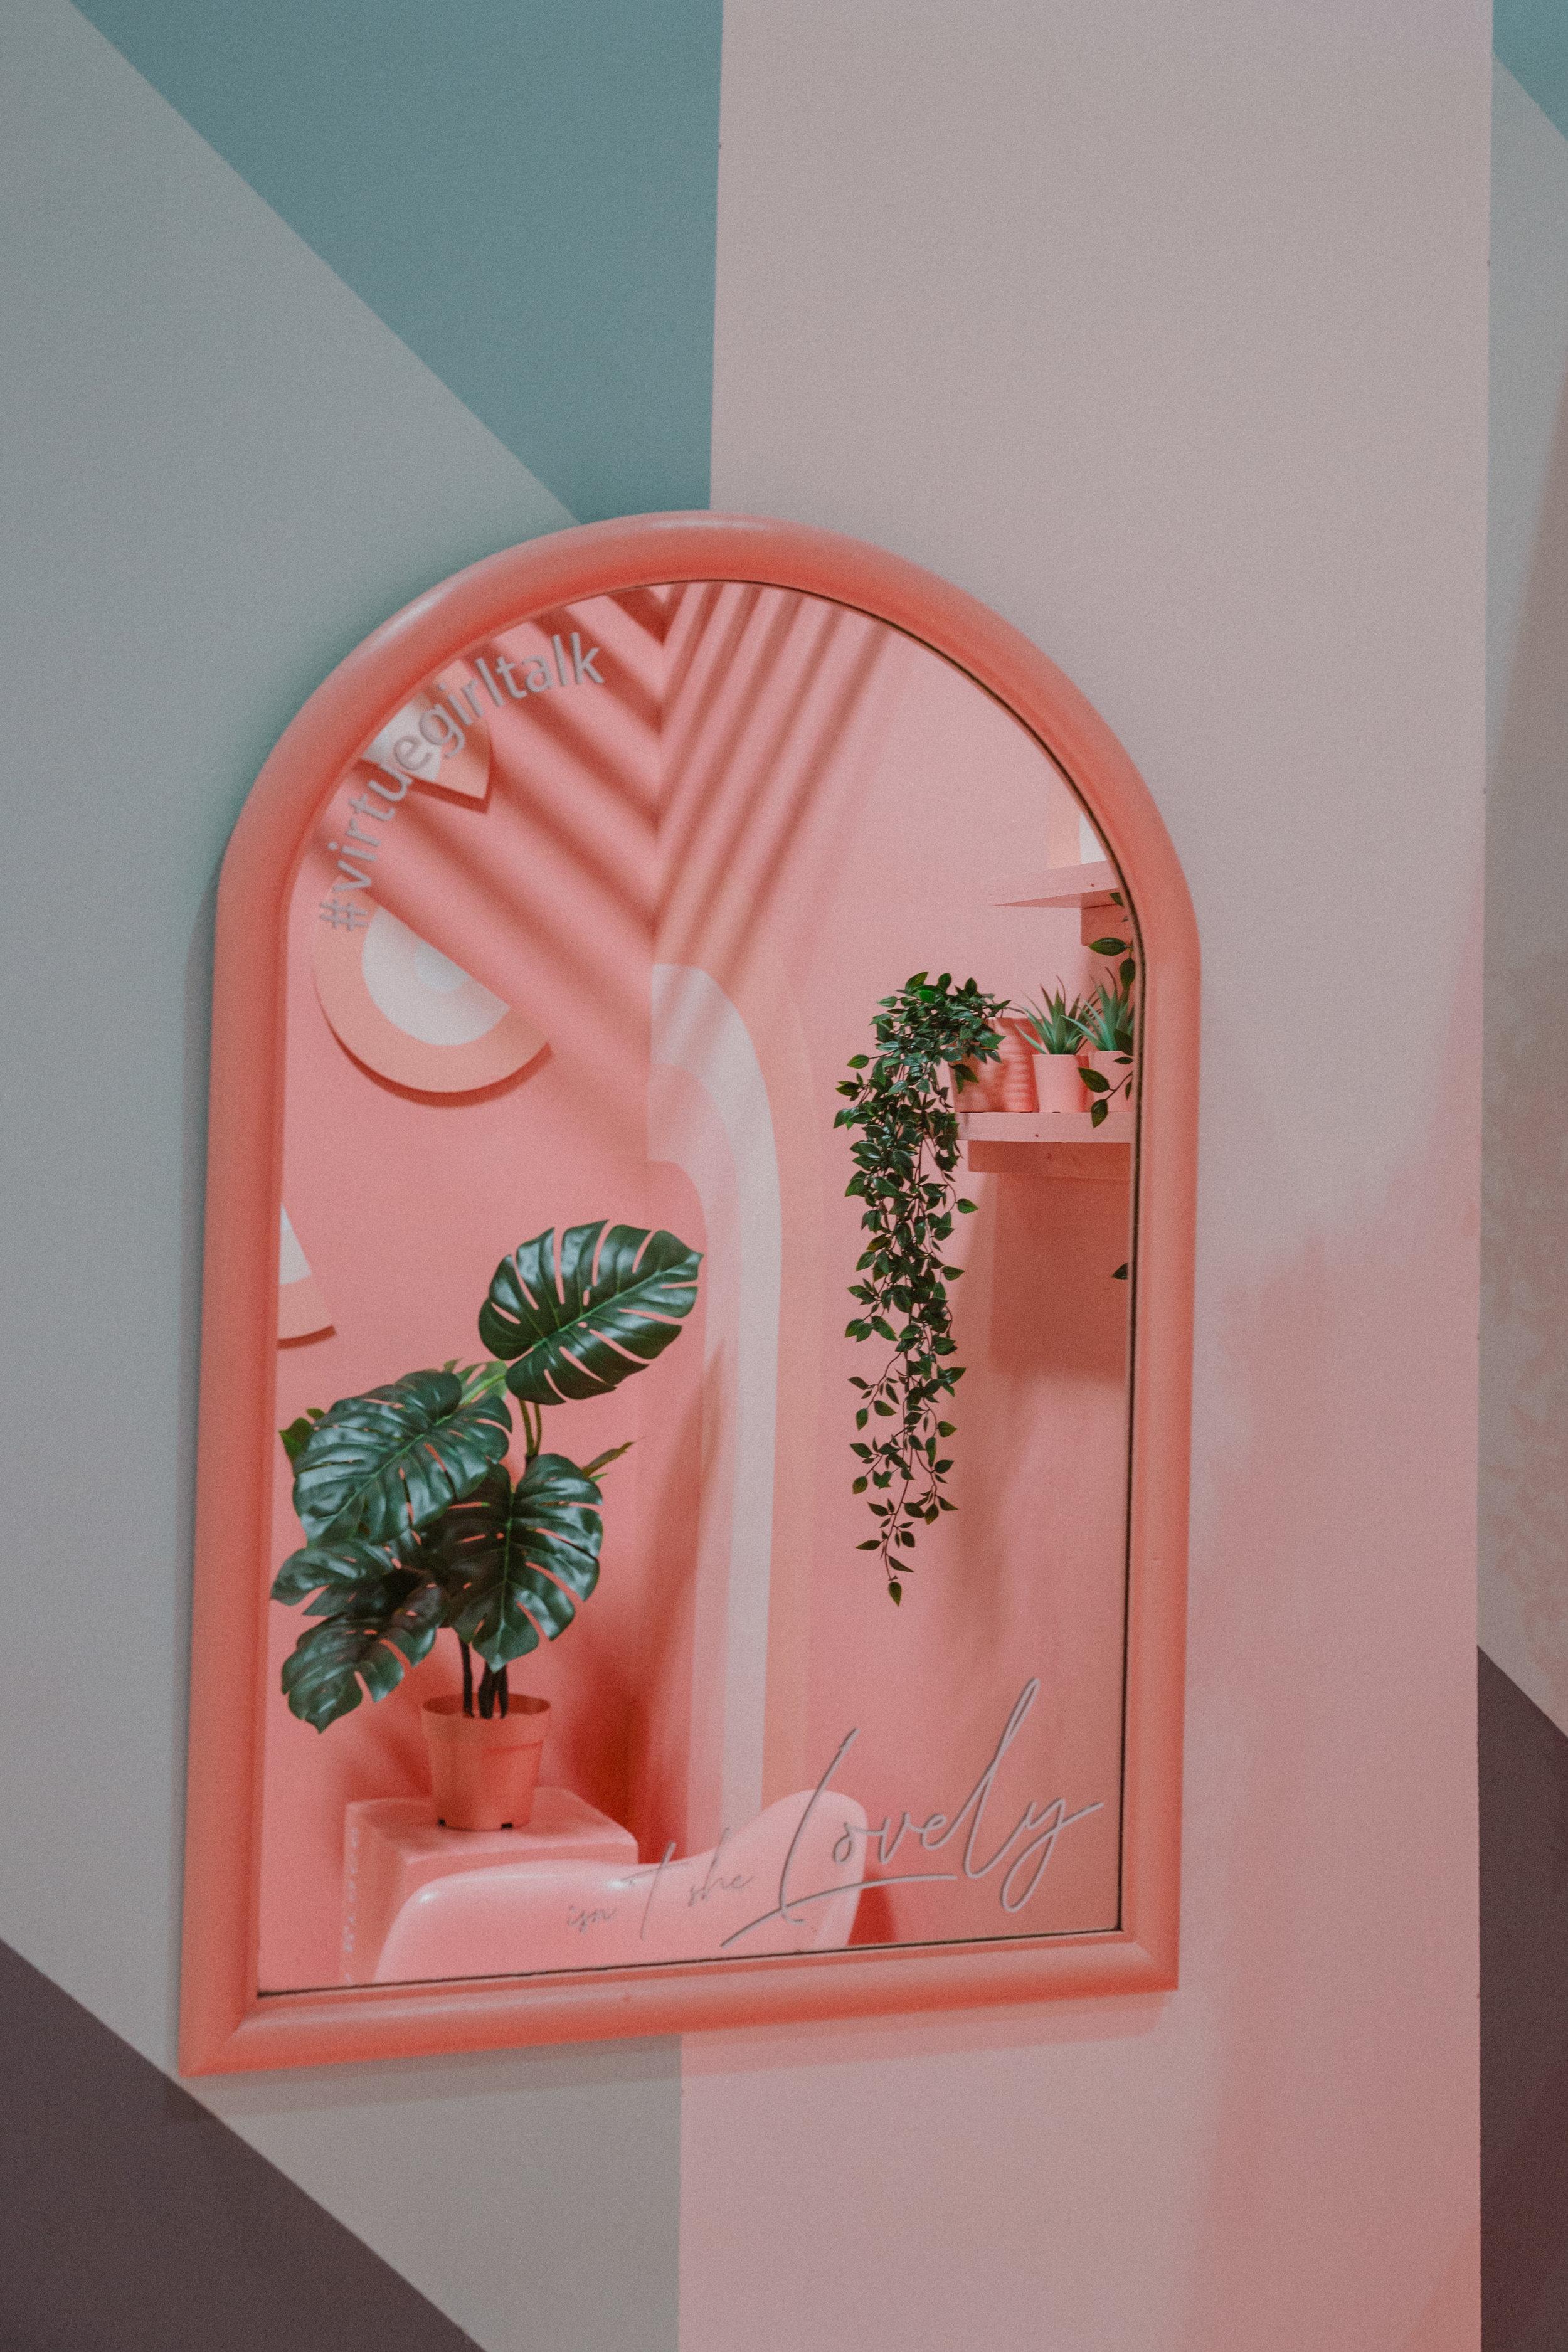 Girl Talk 2019 | Relevant + Raw Installation